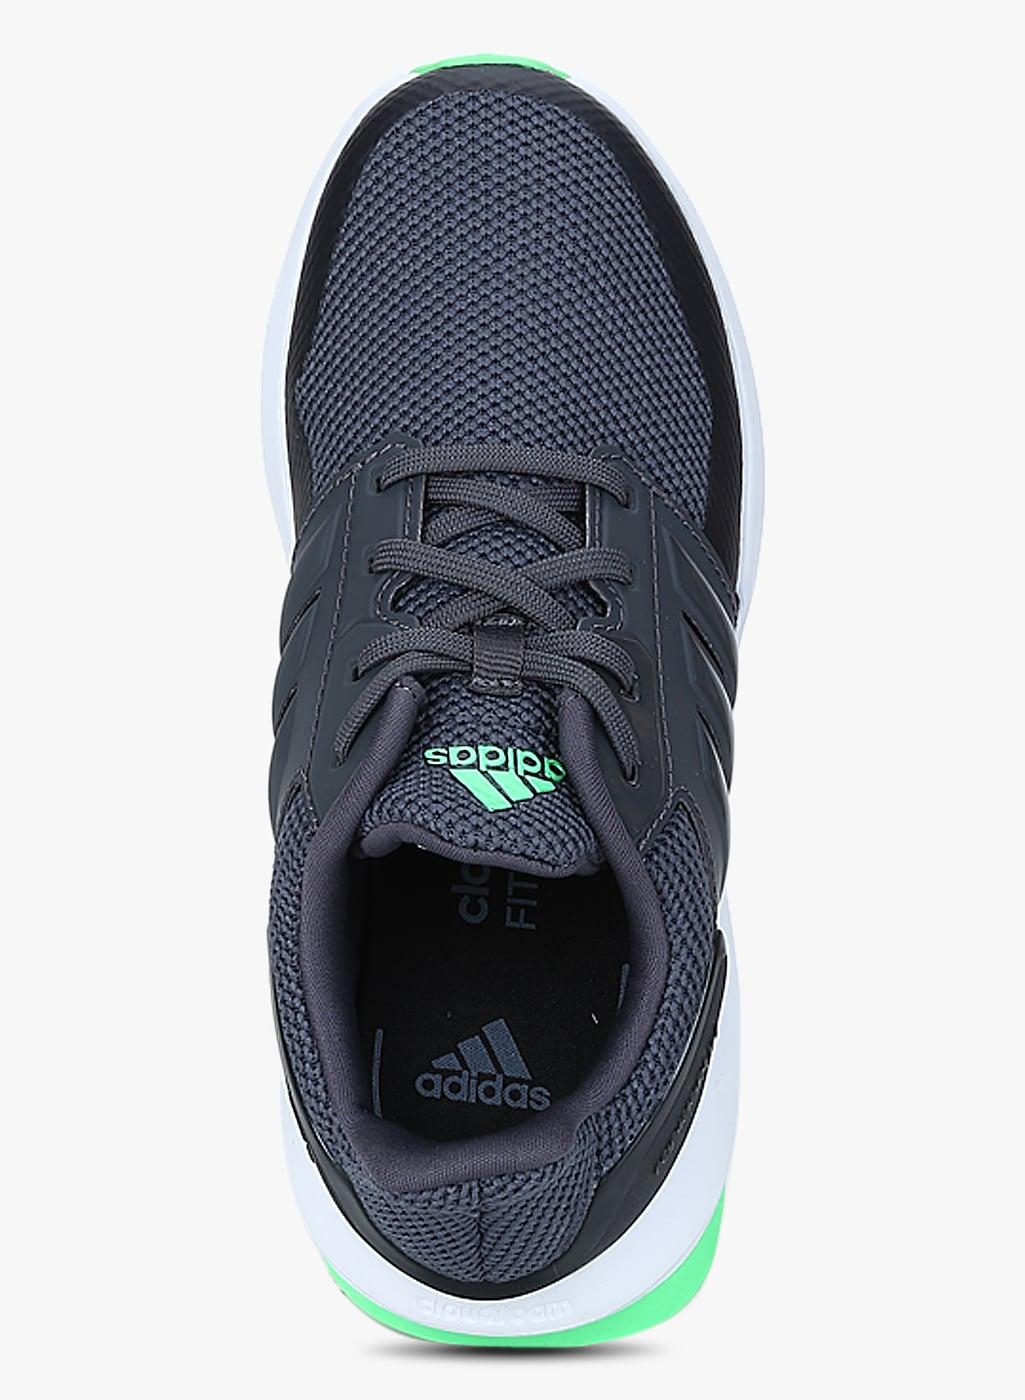 b5a0afde917 Grey Boys Girls Sports Shoes Adidas - Buy Grey Boys Girls Sports Shoes  Adidas online in India - Jabong